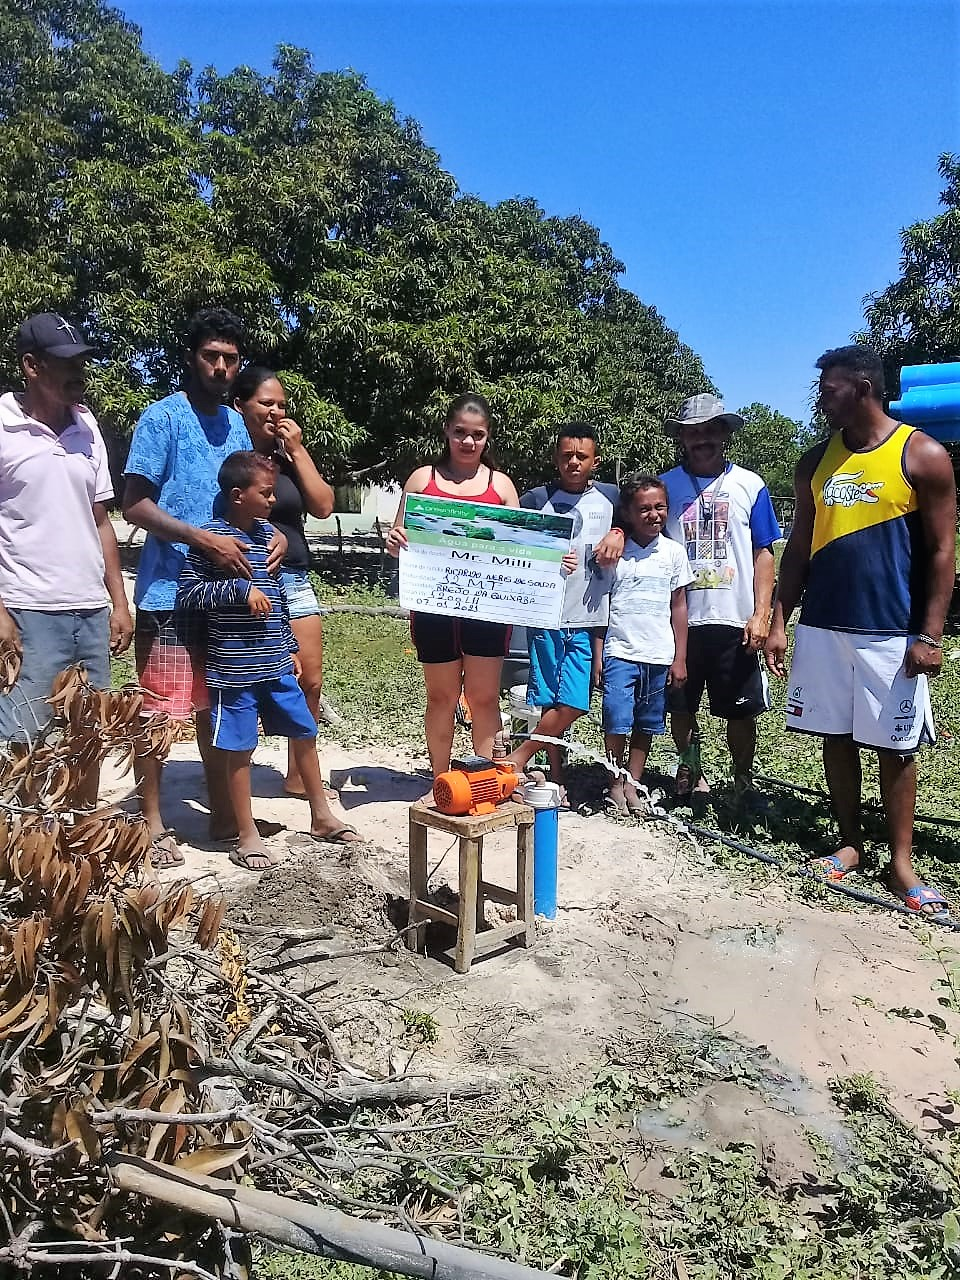 2021-01-07 Bahia - Image 1